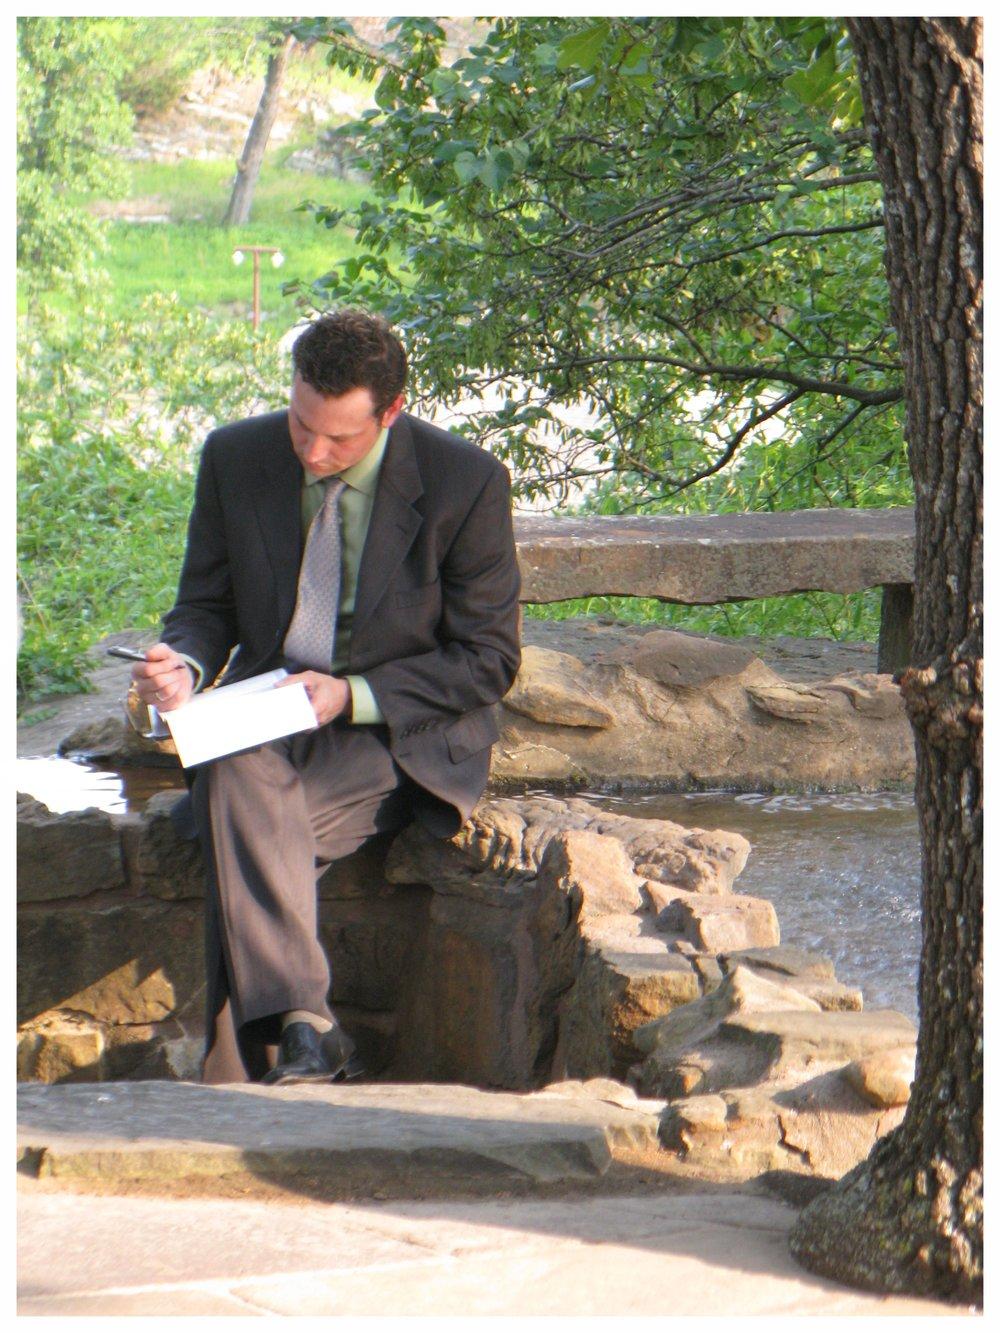 Meet Expert Wedding Officiant: - Reverend Jay Howell